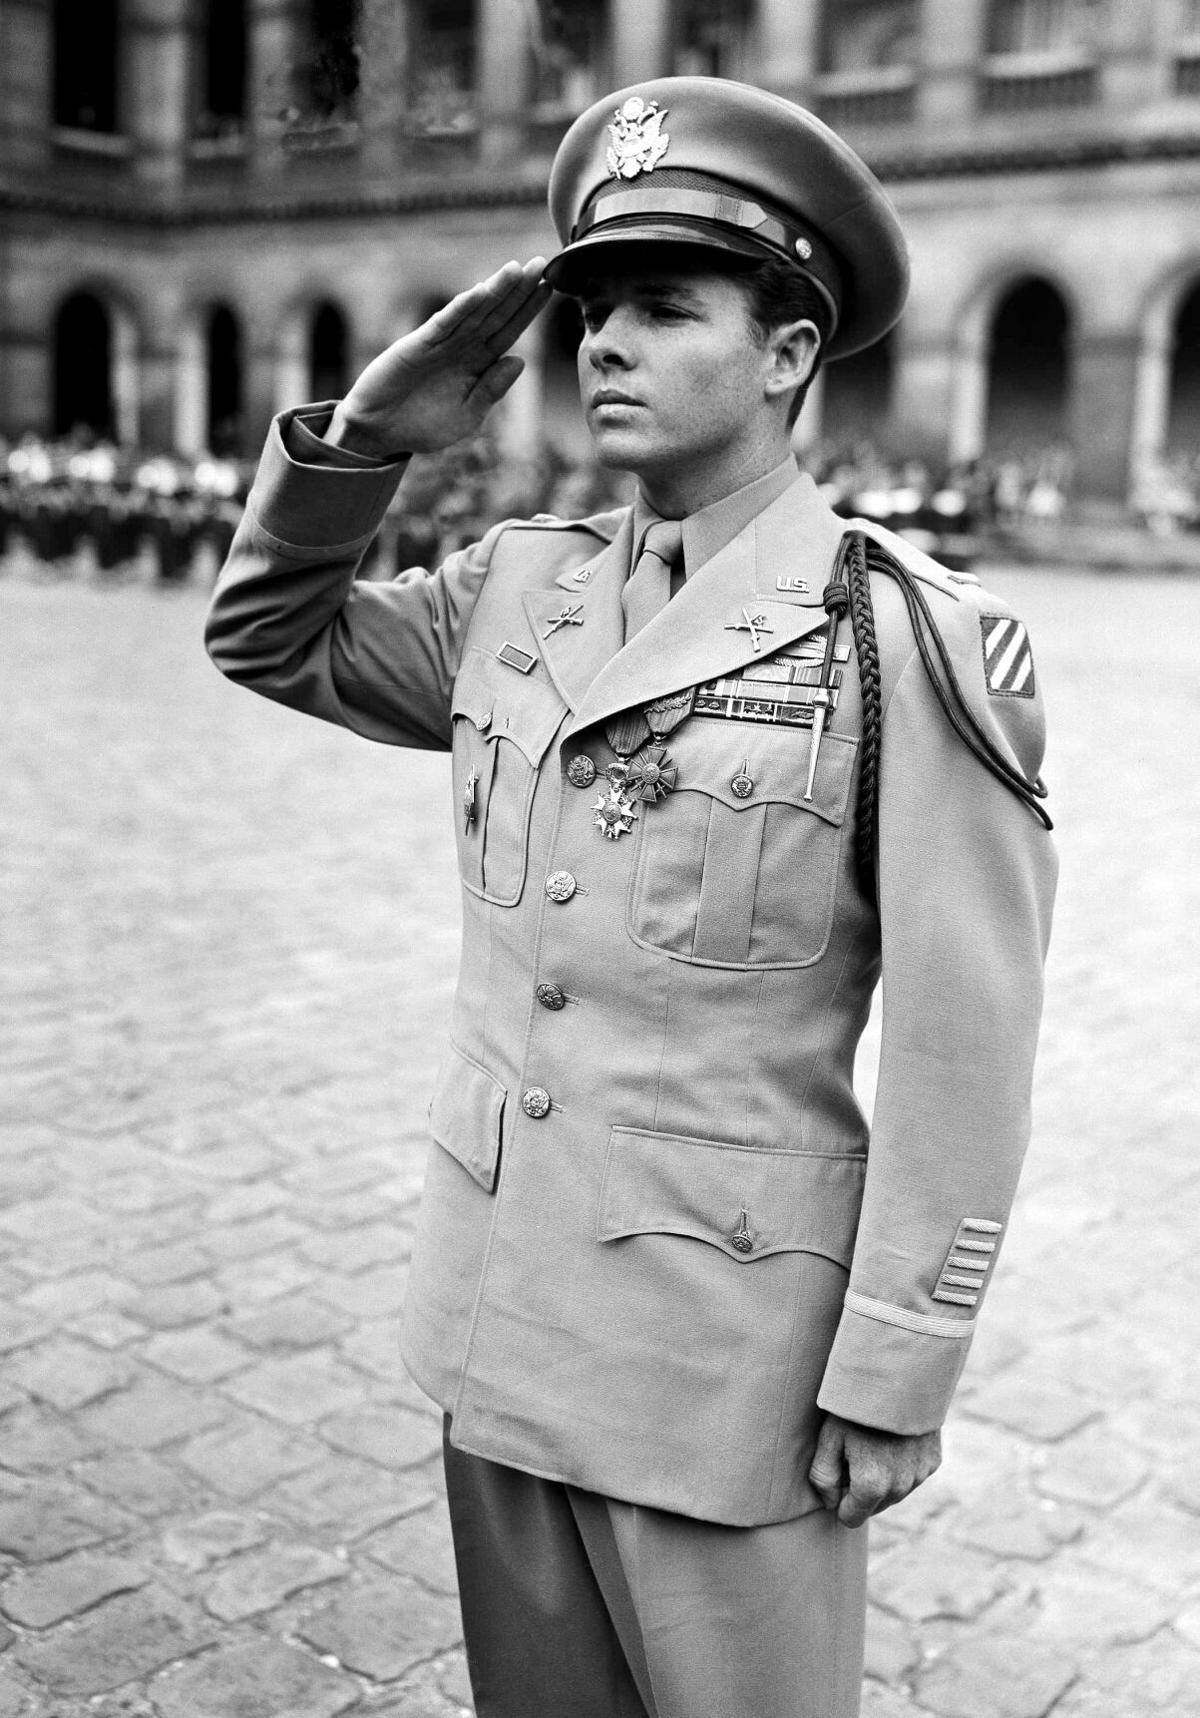 Lt. Audie Murphy